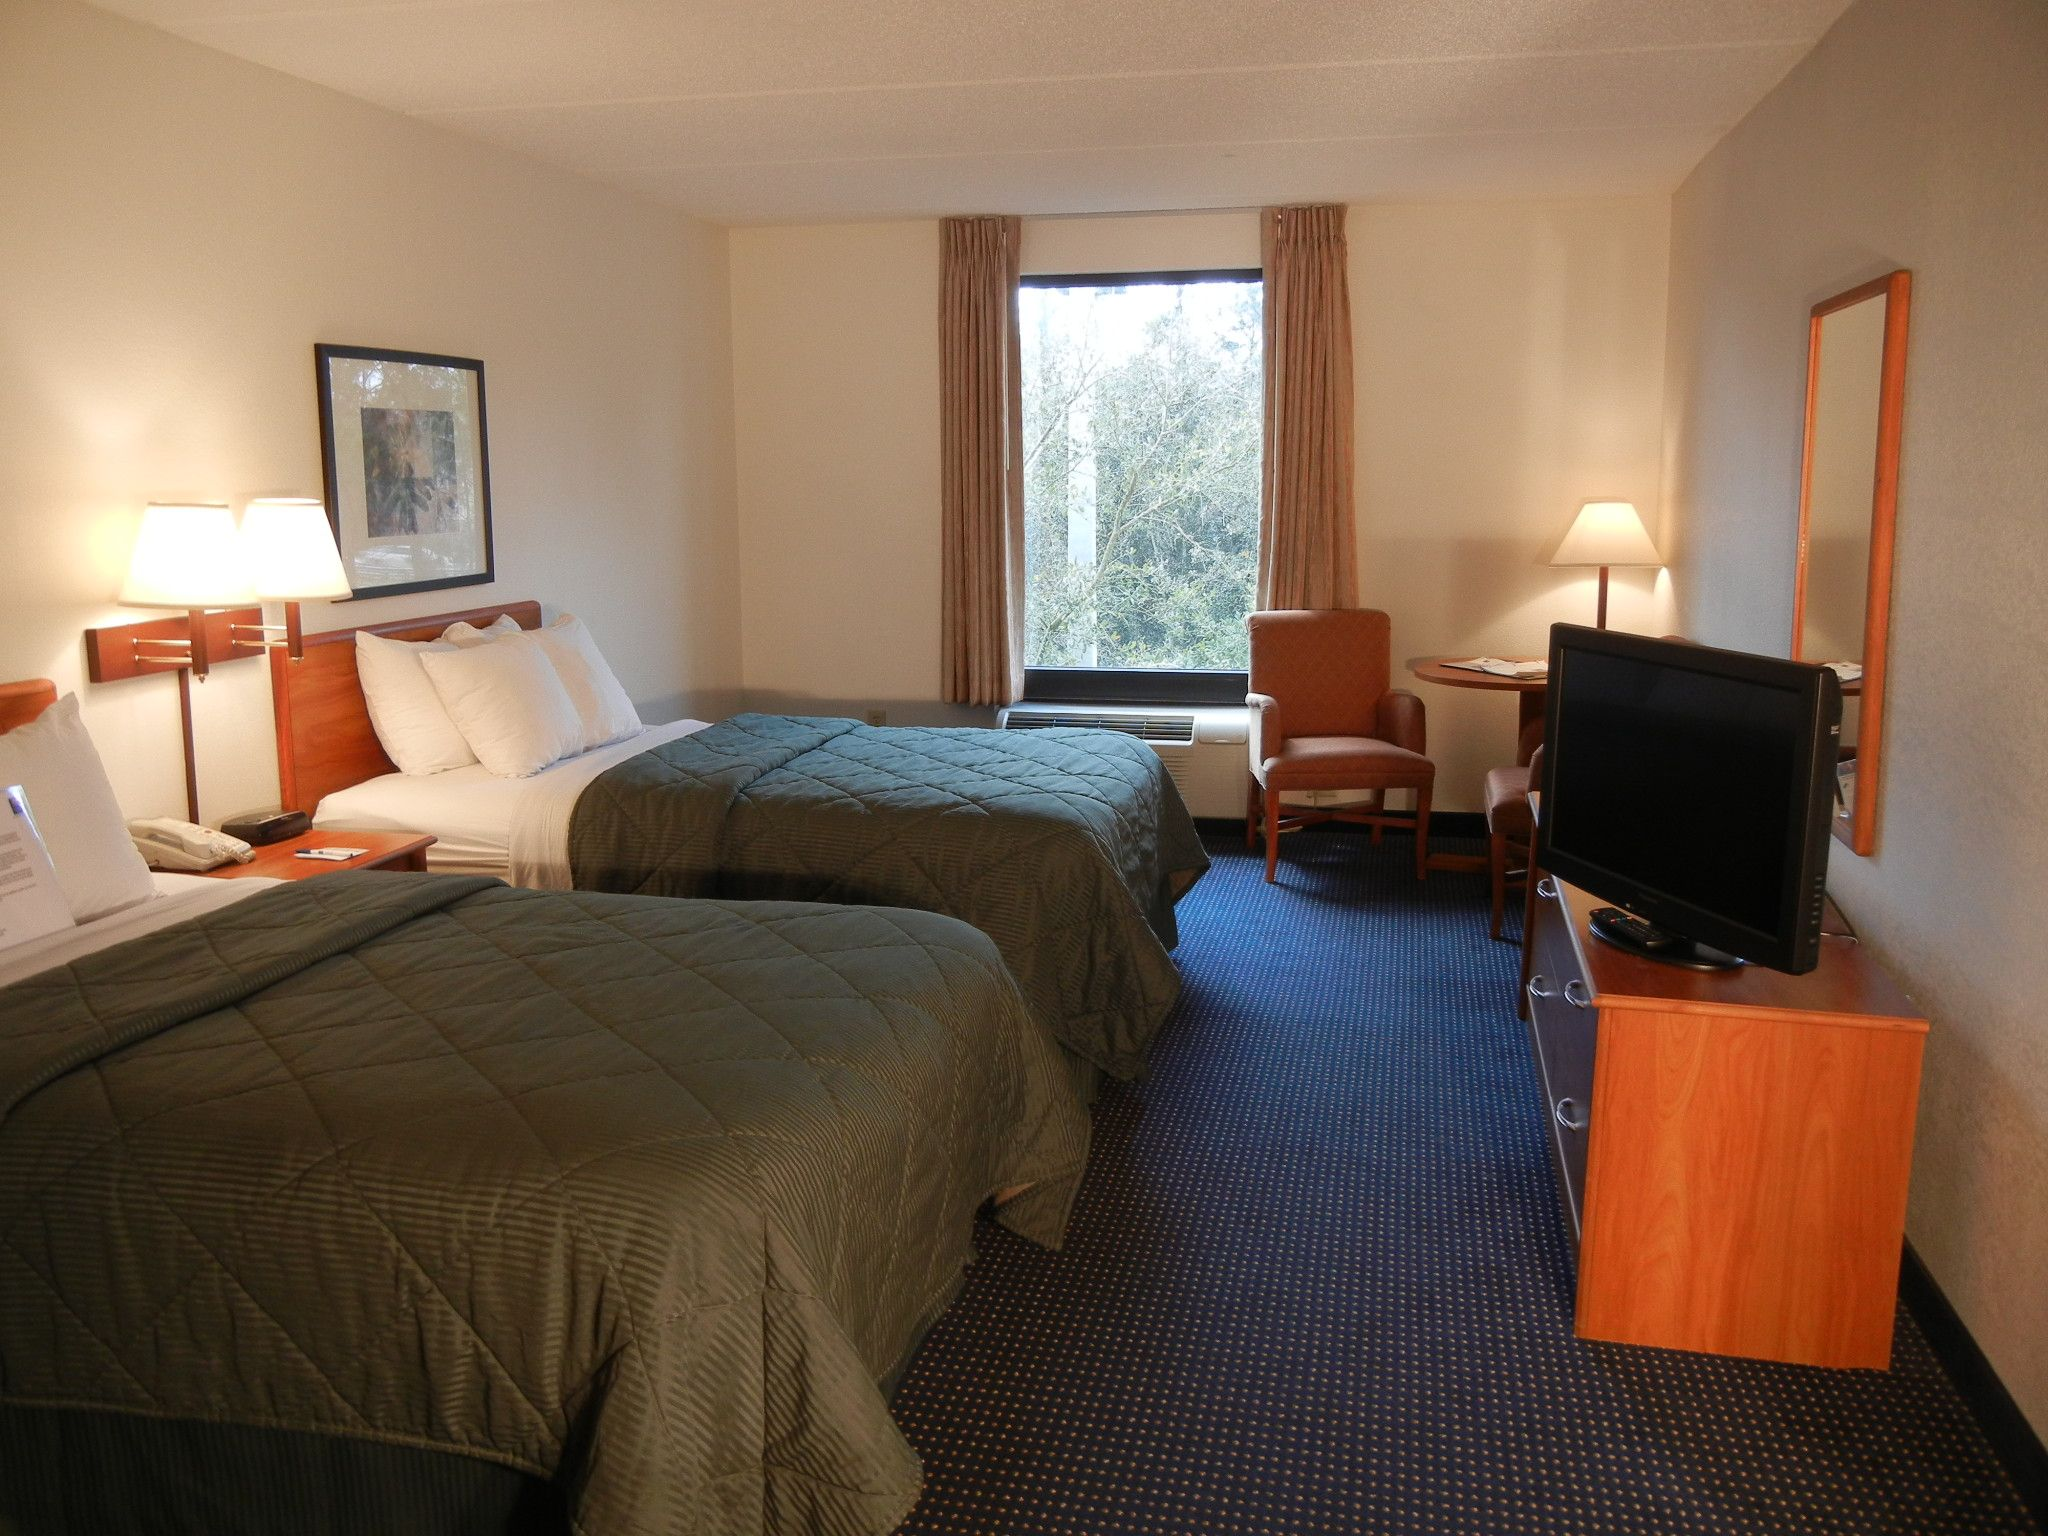 Comfort Inn University Standard Double Bed Two Double Beds With Activity Table Double Beds Bed Home